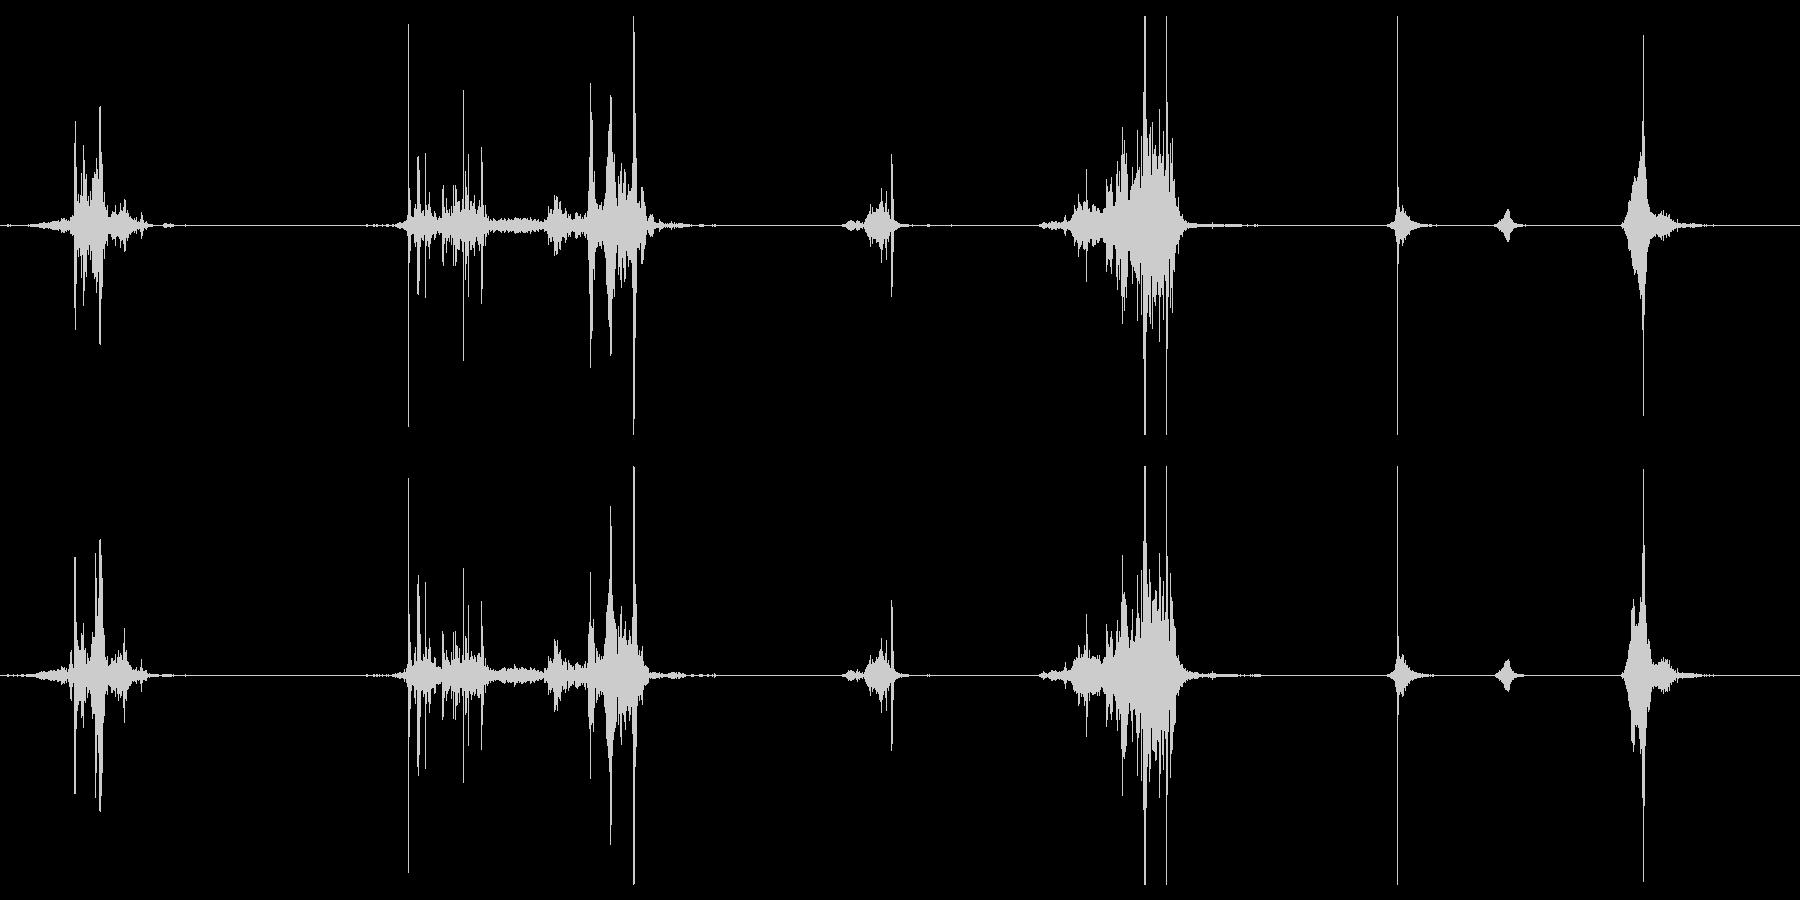 ASMR りんごを歯でかじりついている音の未再生の波形